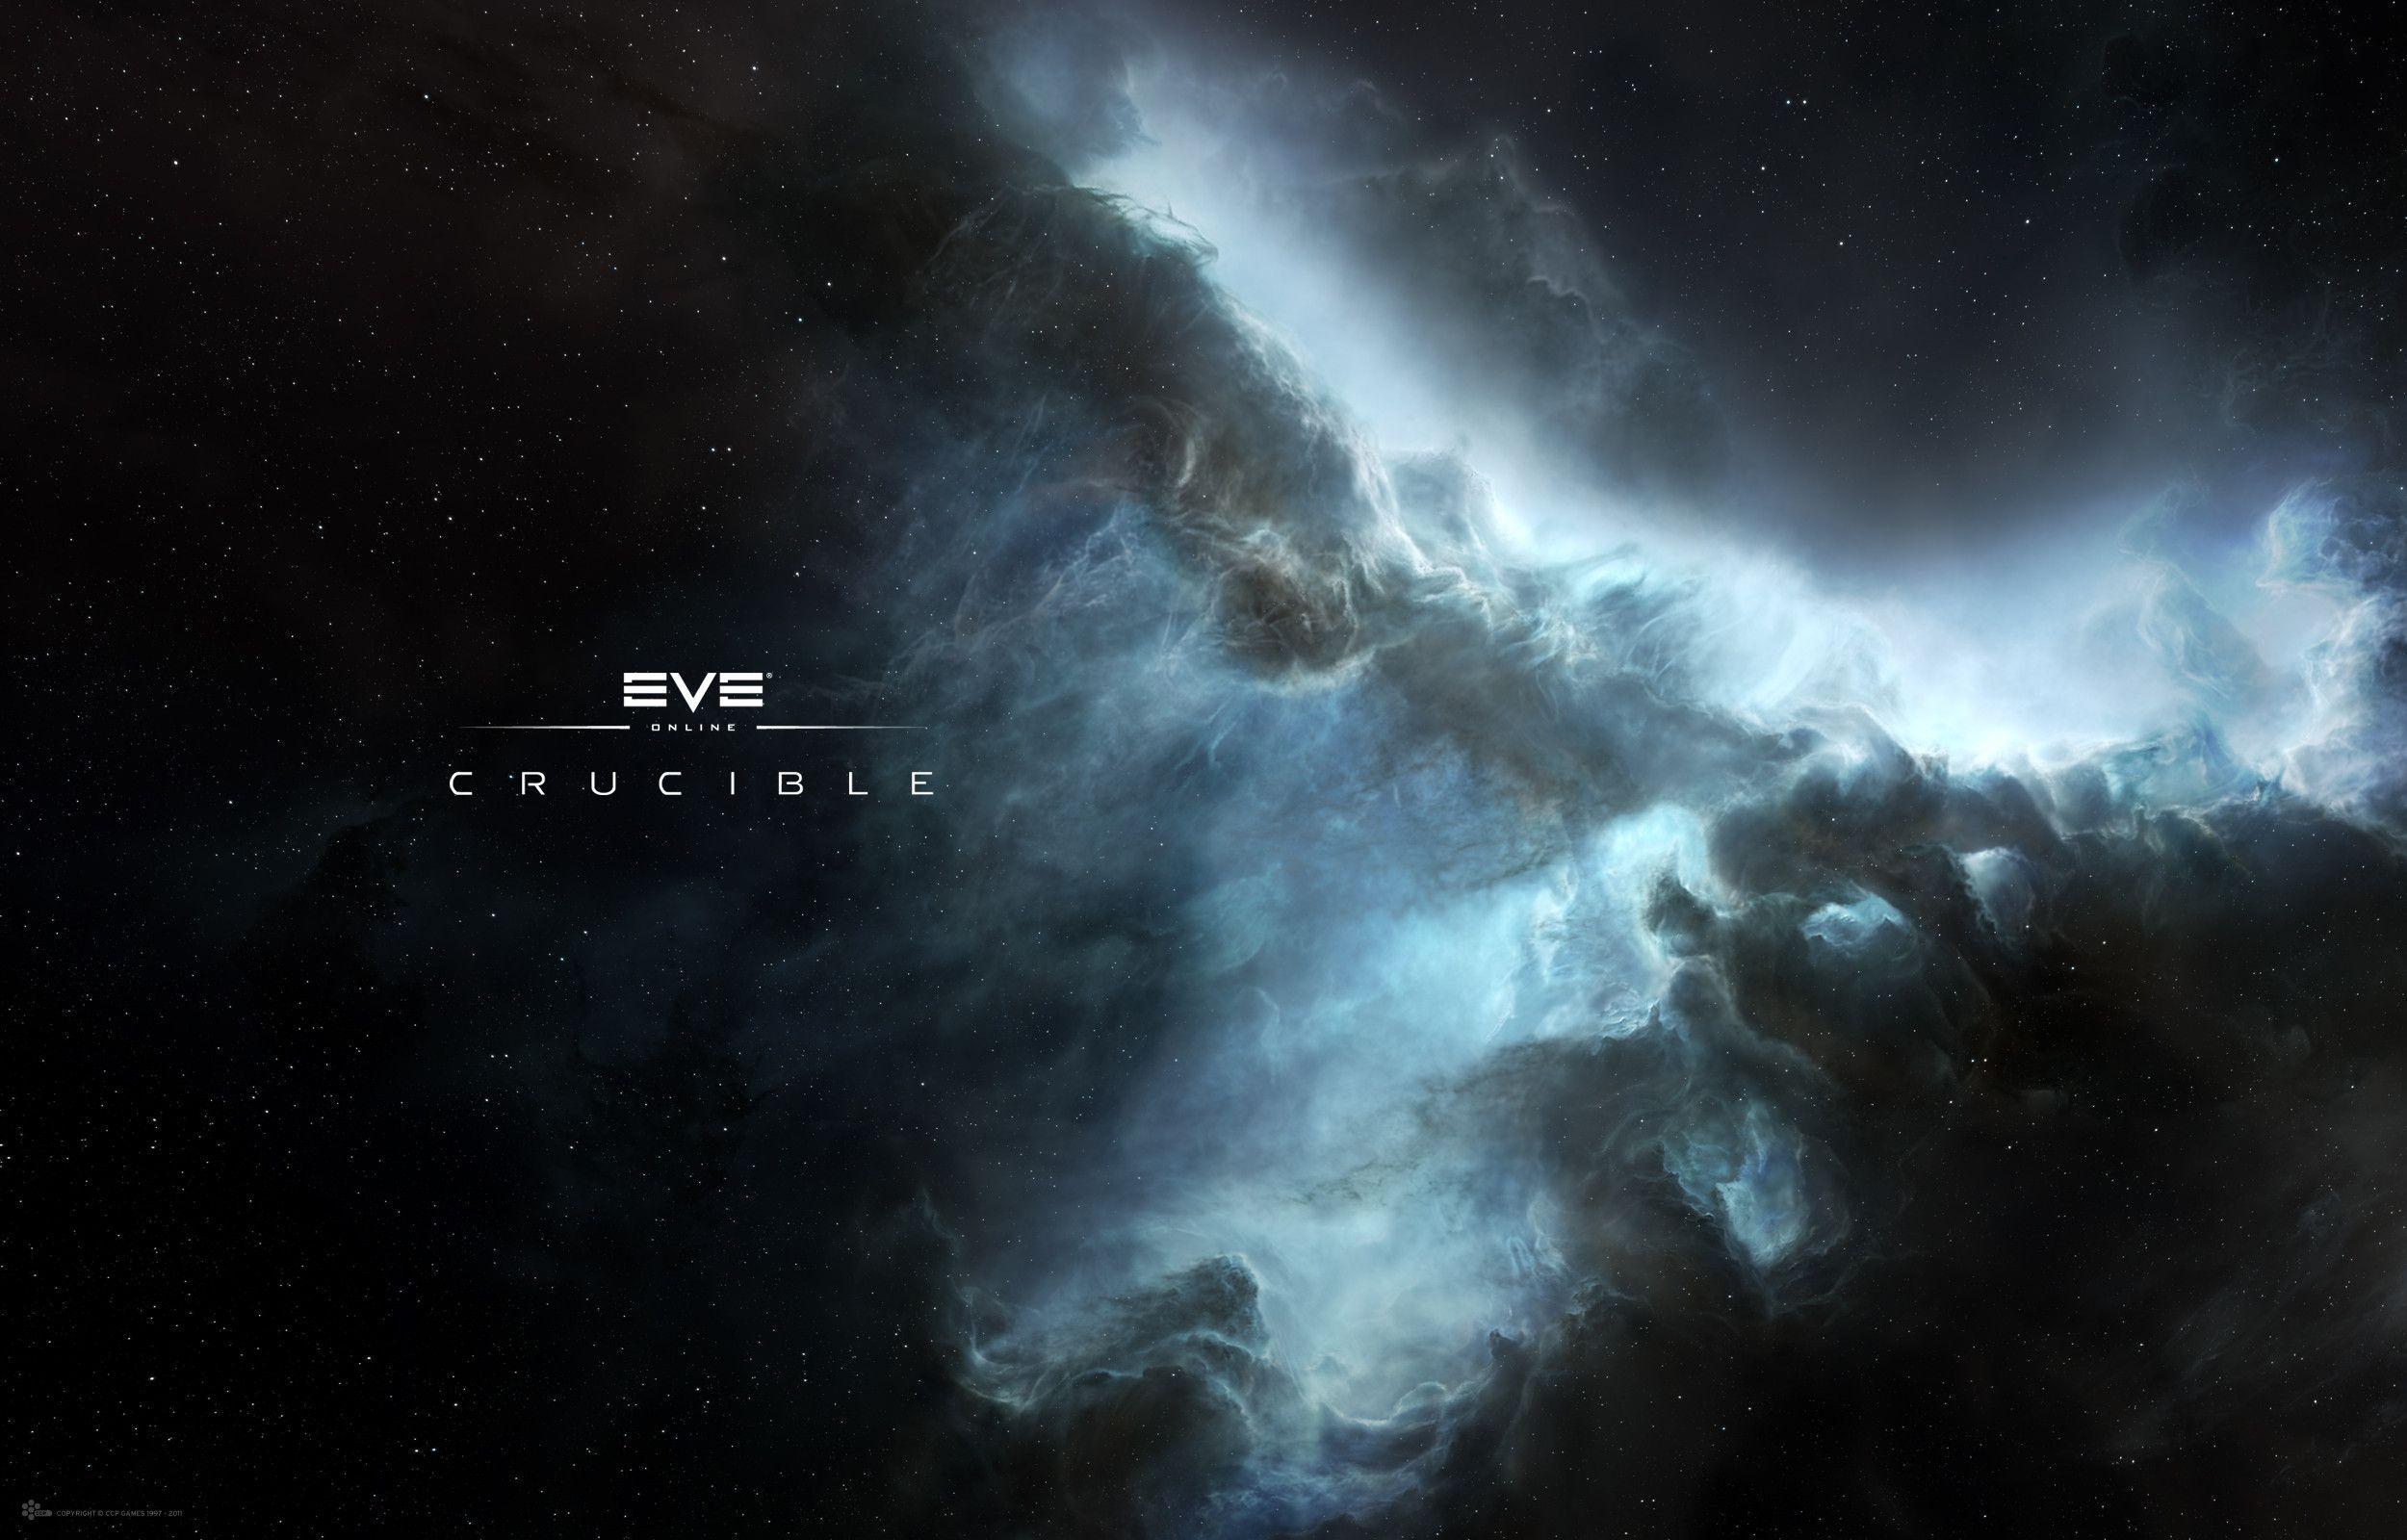 Eve Online Gallente Wallpapers in jpg format for free download